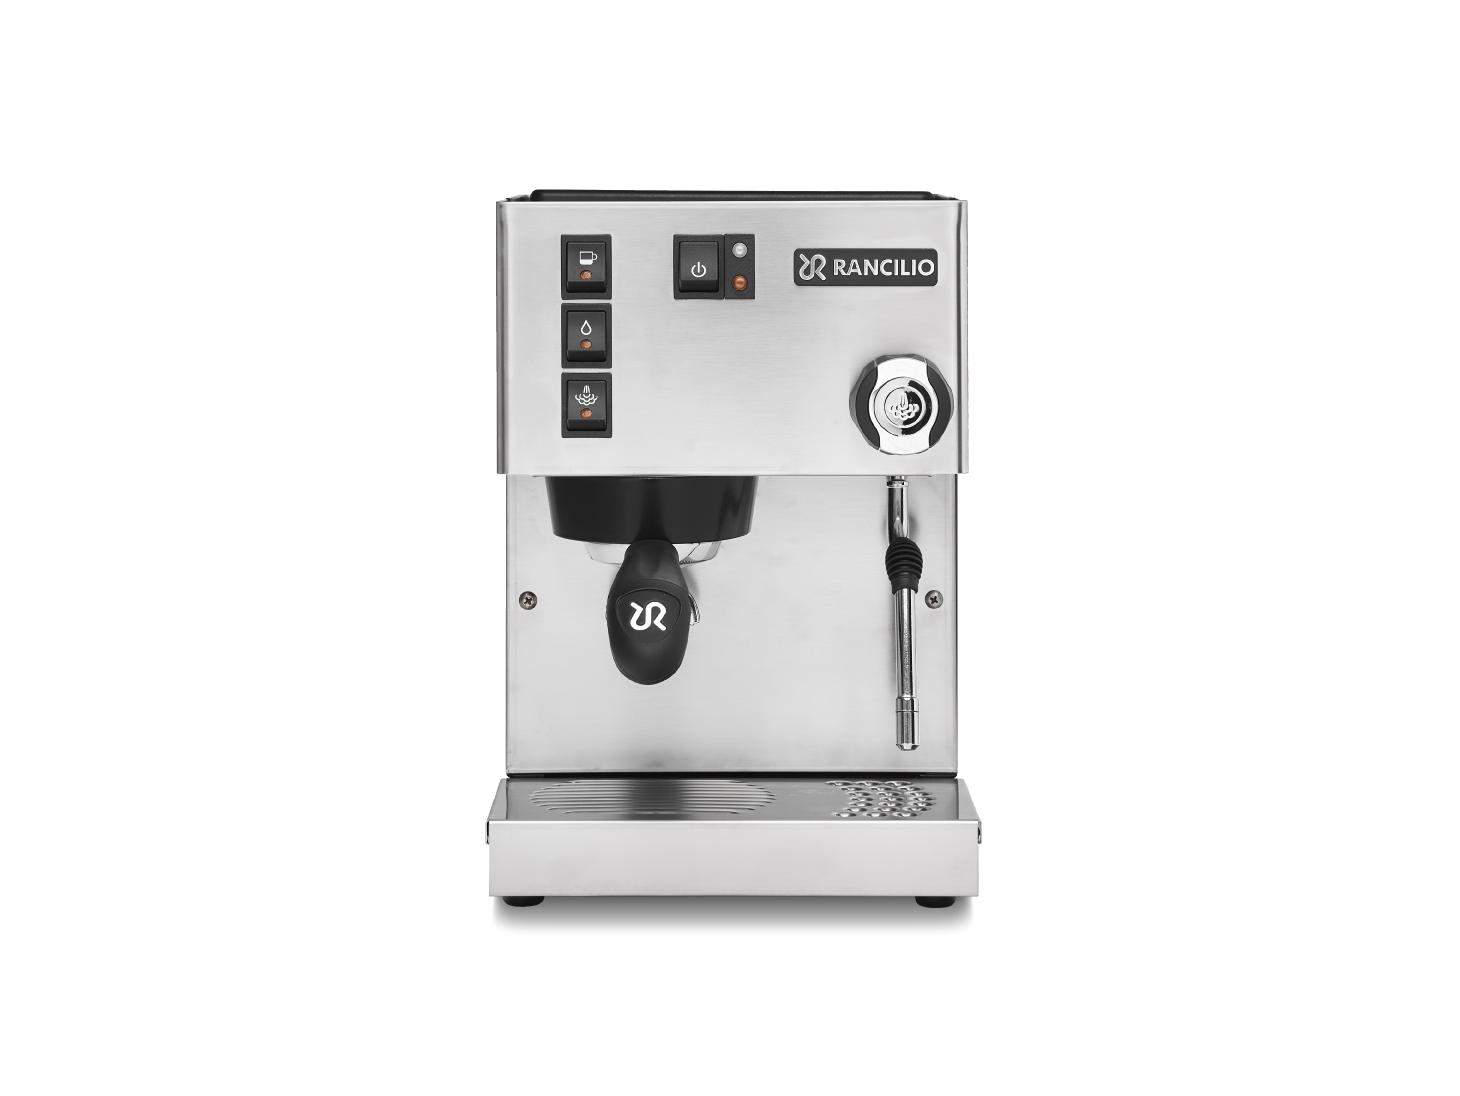 Rancilio Silvia M V6 2020 Update Manual Espresso Machine